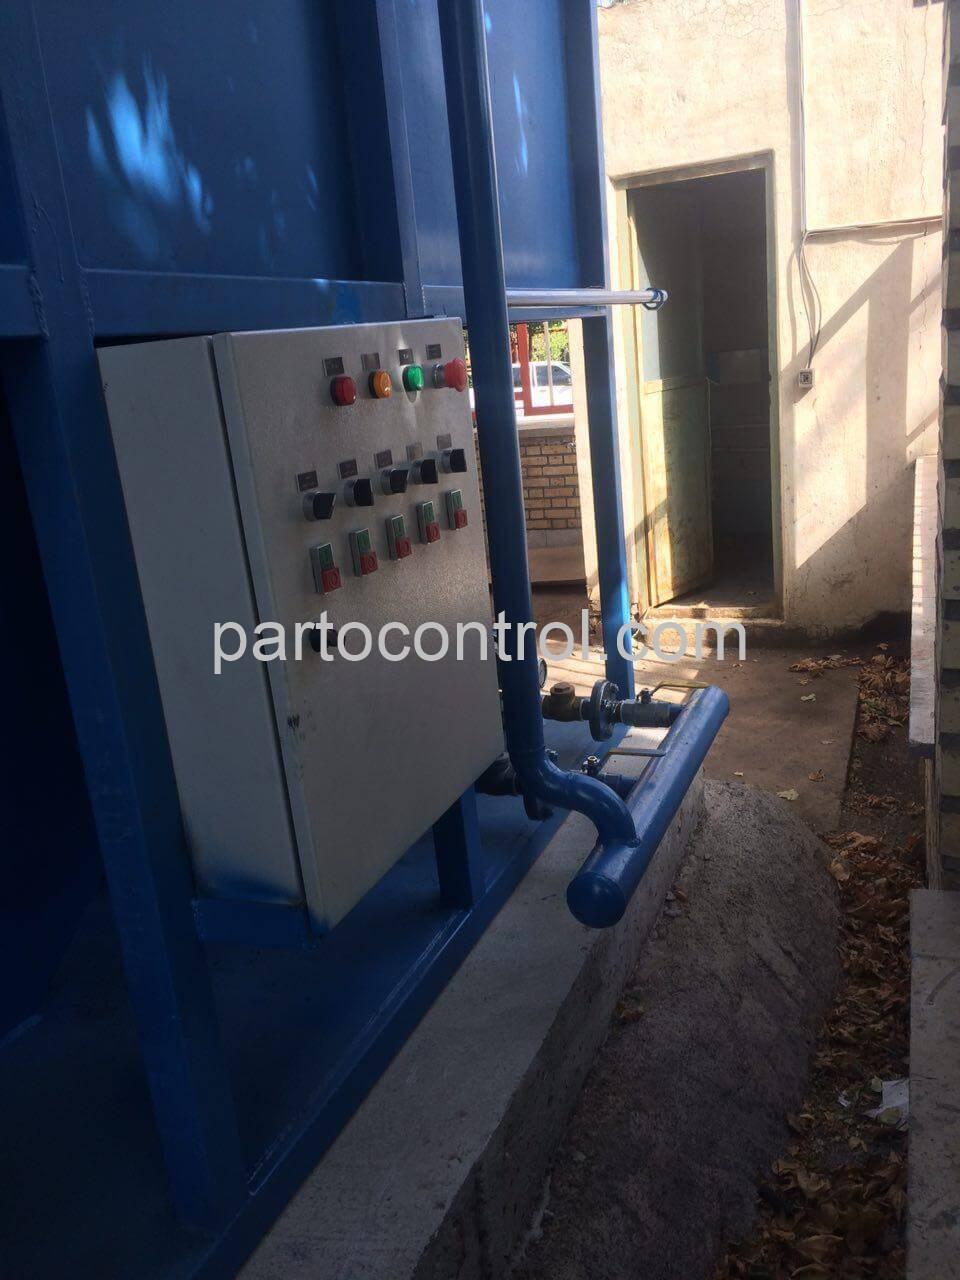 Carwash Sewage Treatment Packageپکیج تصفیه فاضلاب کارواش نصیر ماشین2 - پروژه تصفیه فاضلاب کارواش